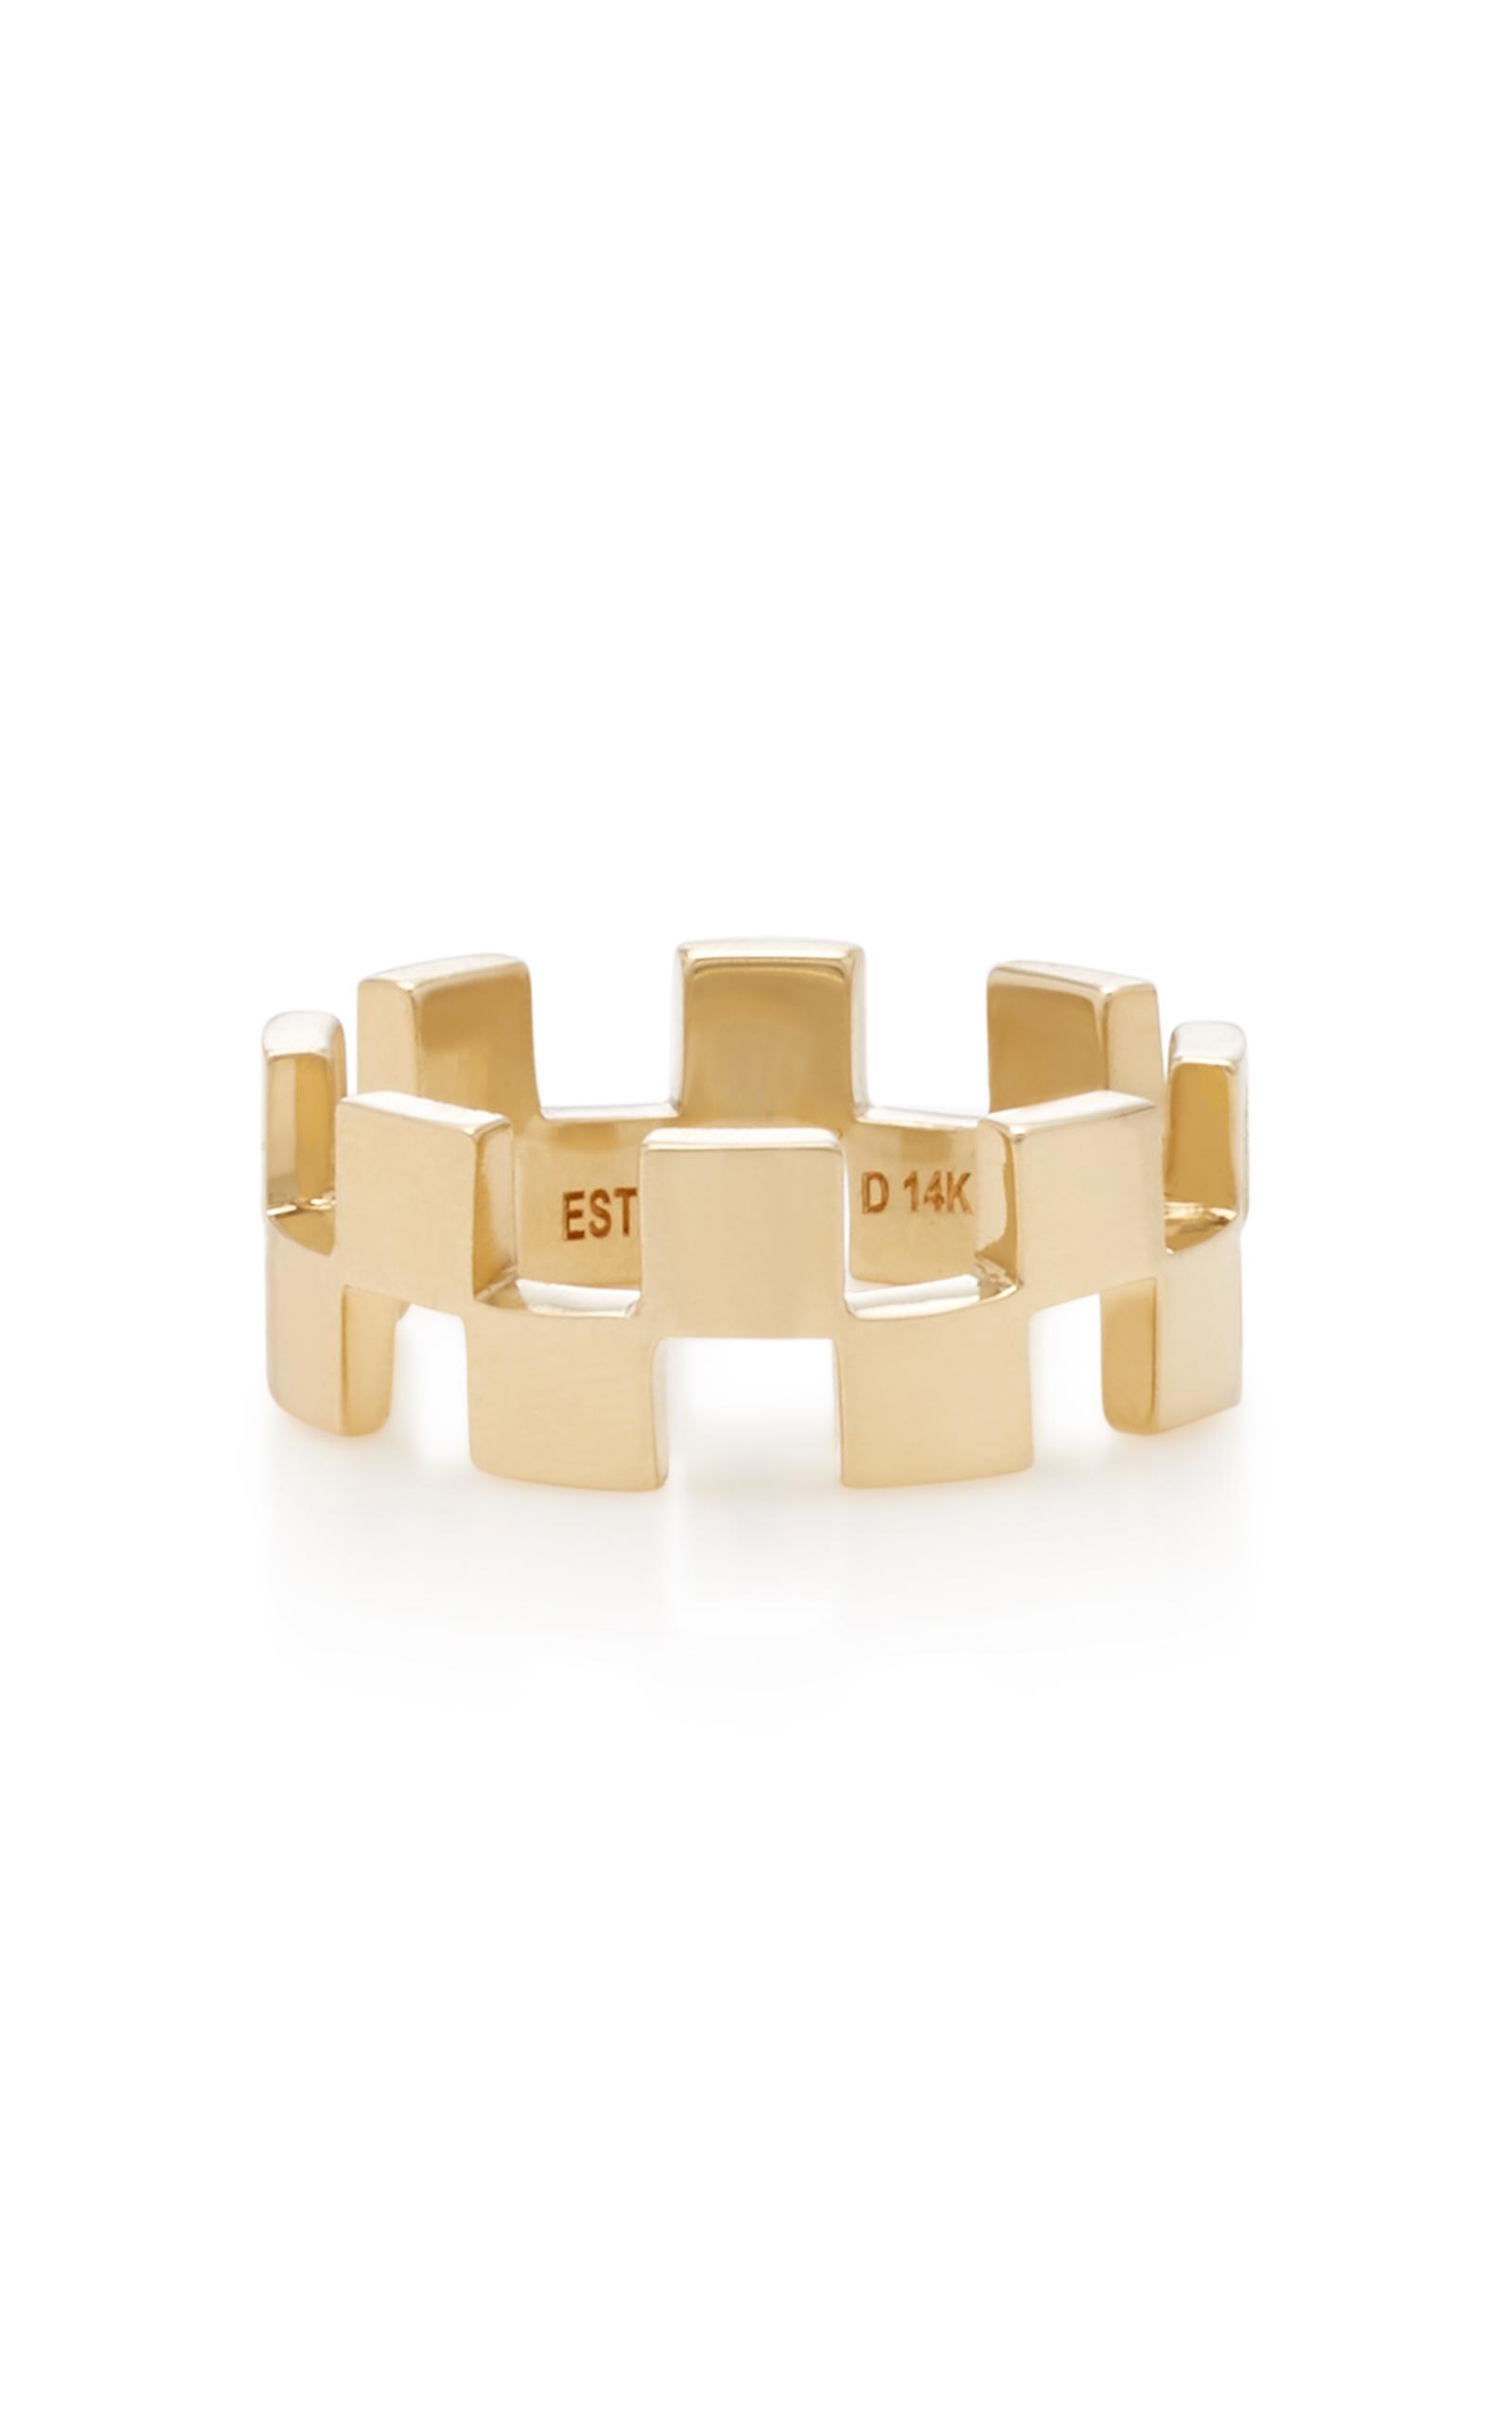 Checker Gallery 18K Gold Earrings Established 3t7p2